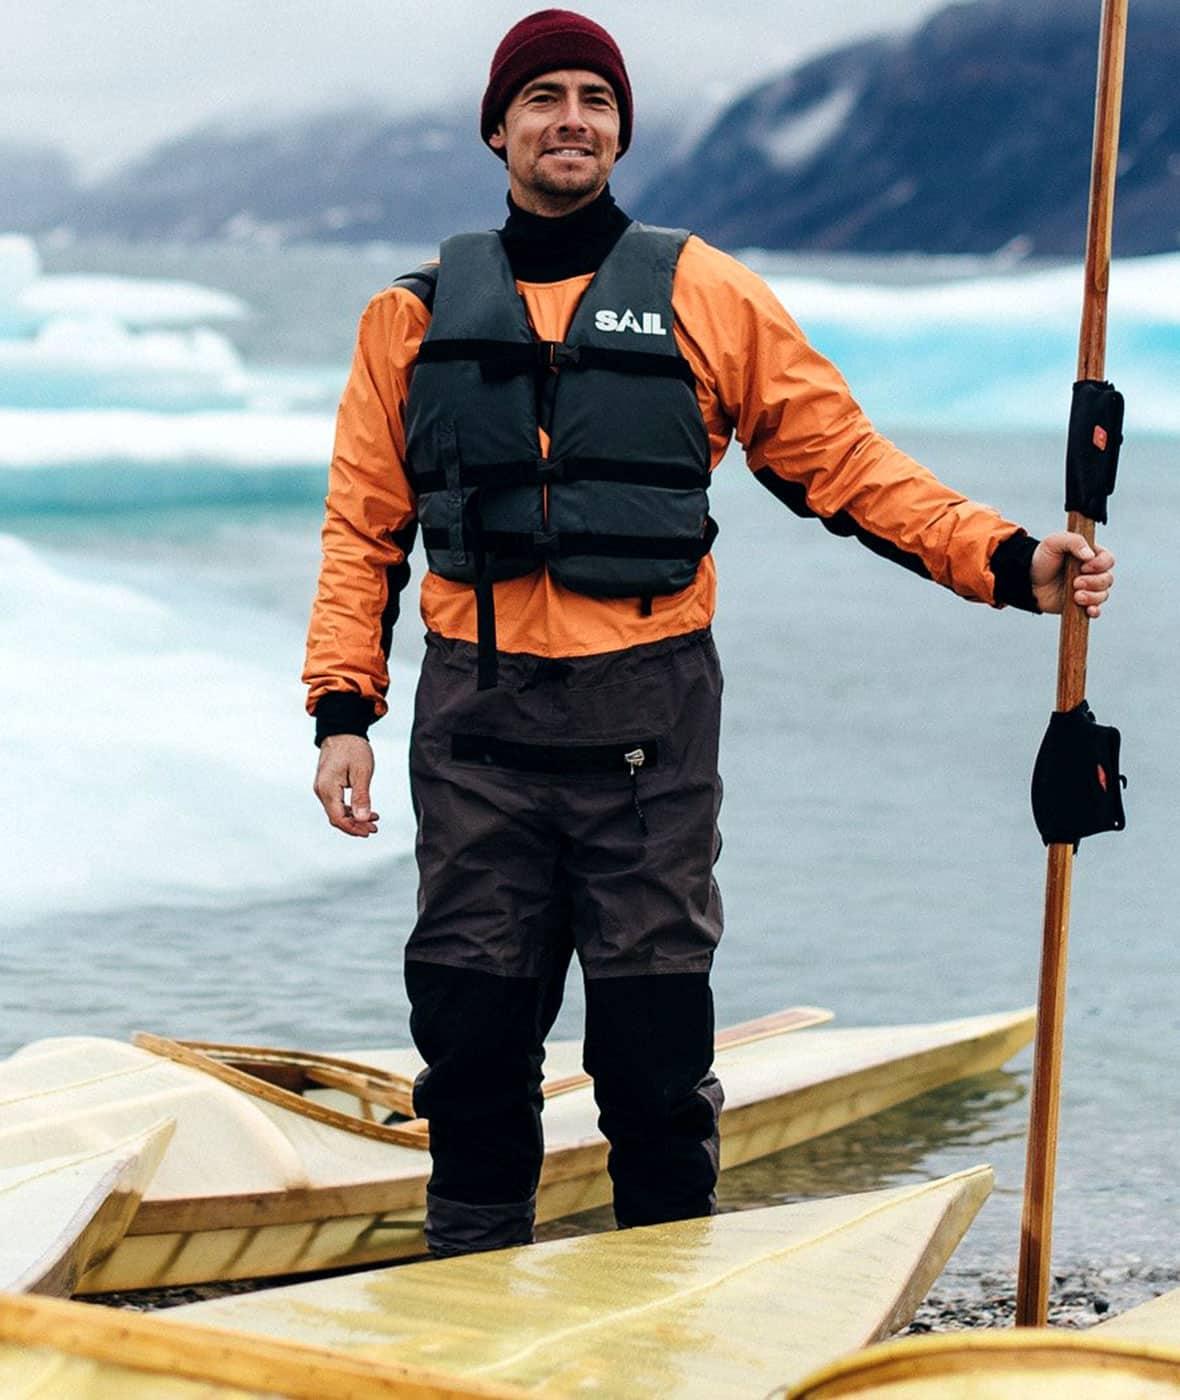 The kayak is the classroom — the polar circle is the teacher